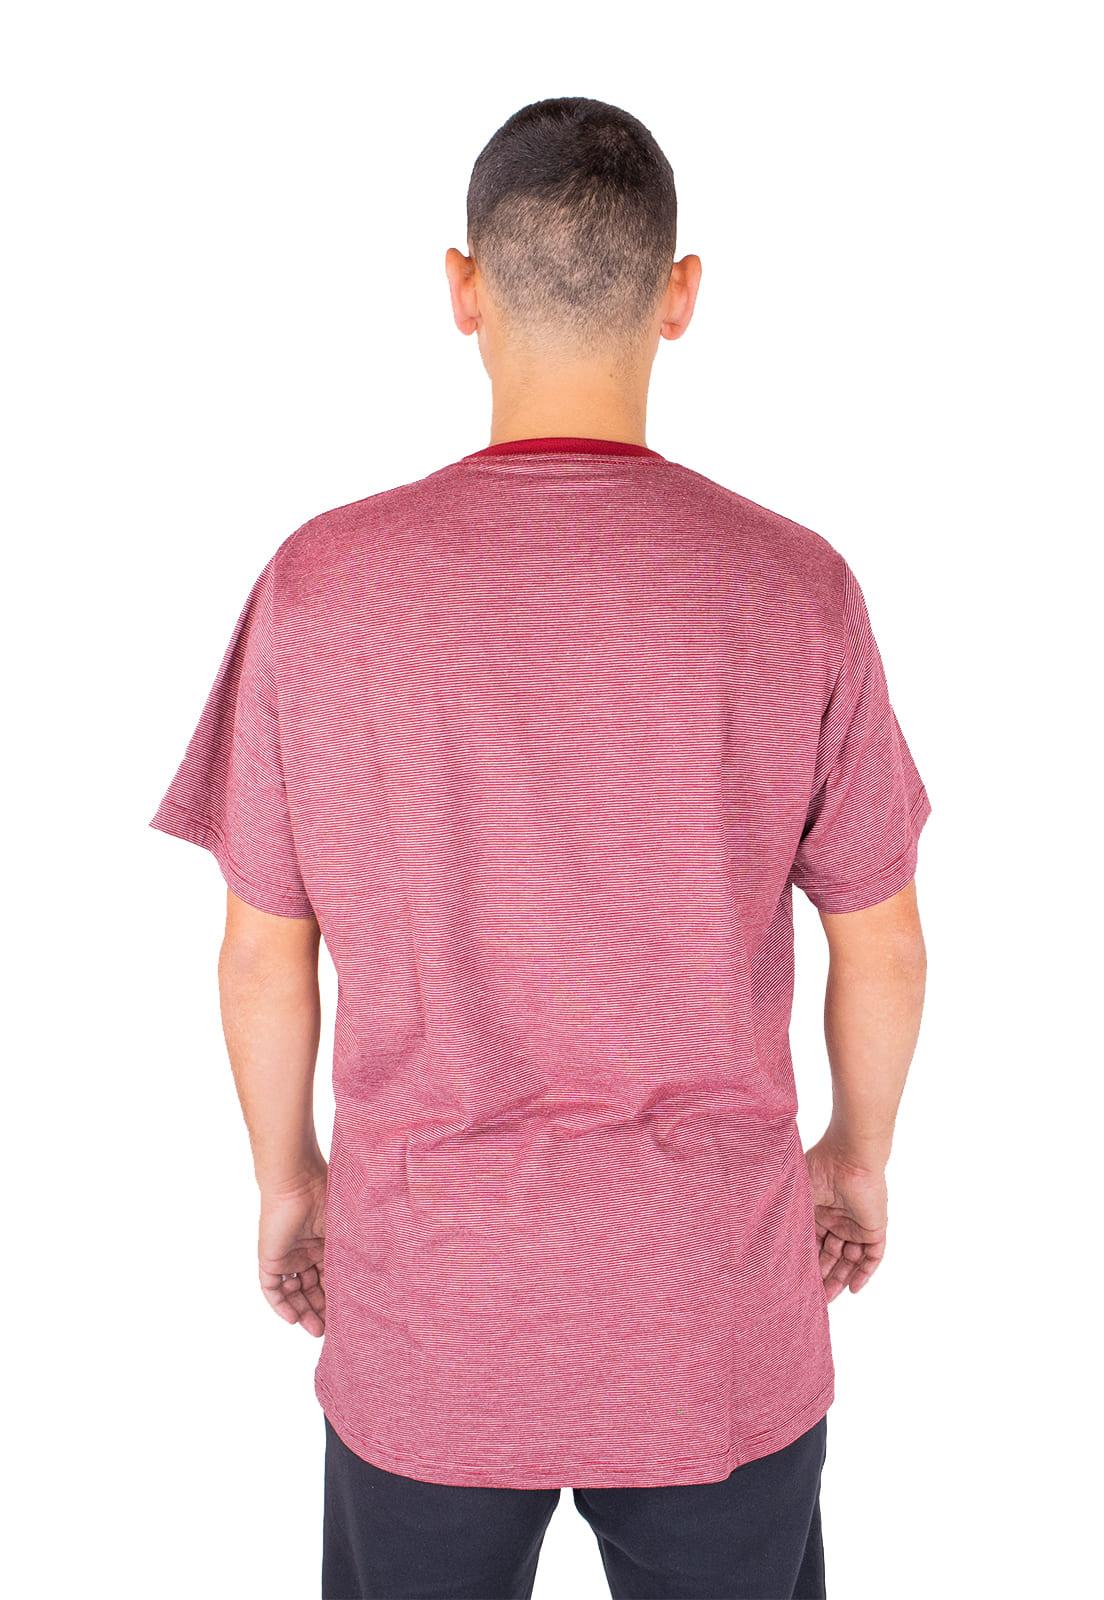 Camiseta Cisco Skate Clothing Assinatura